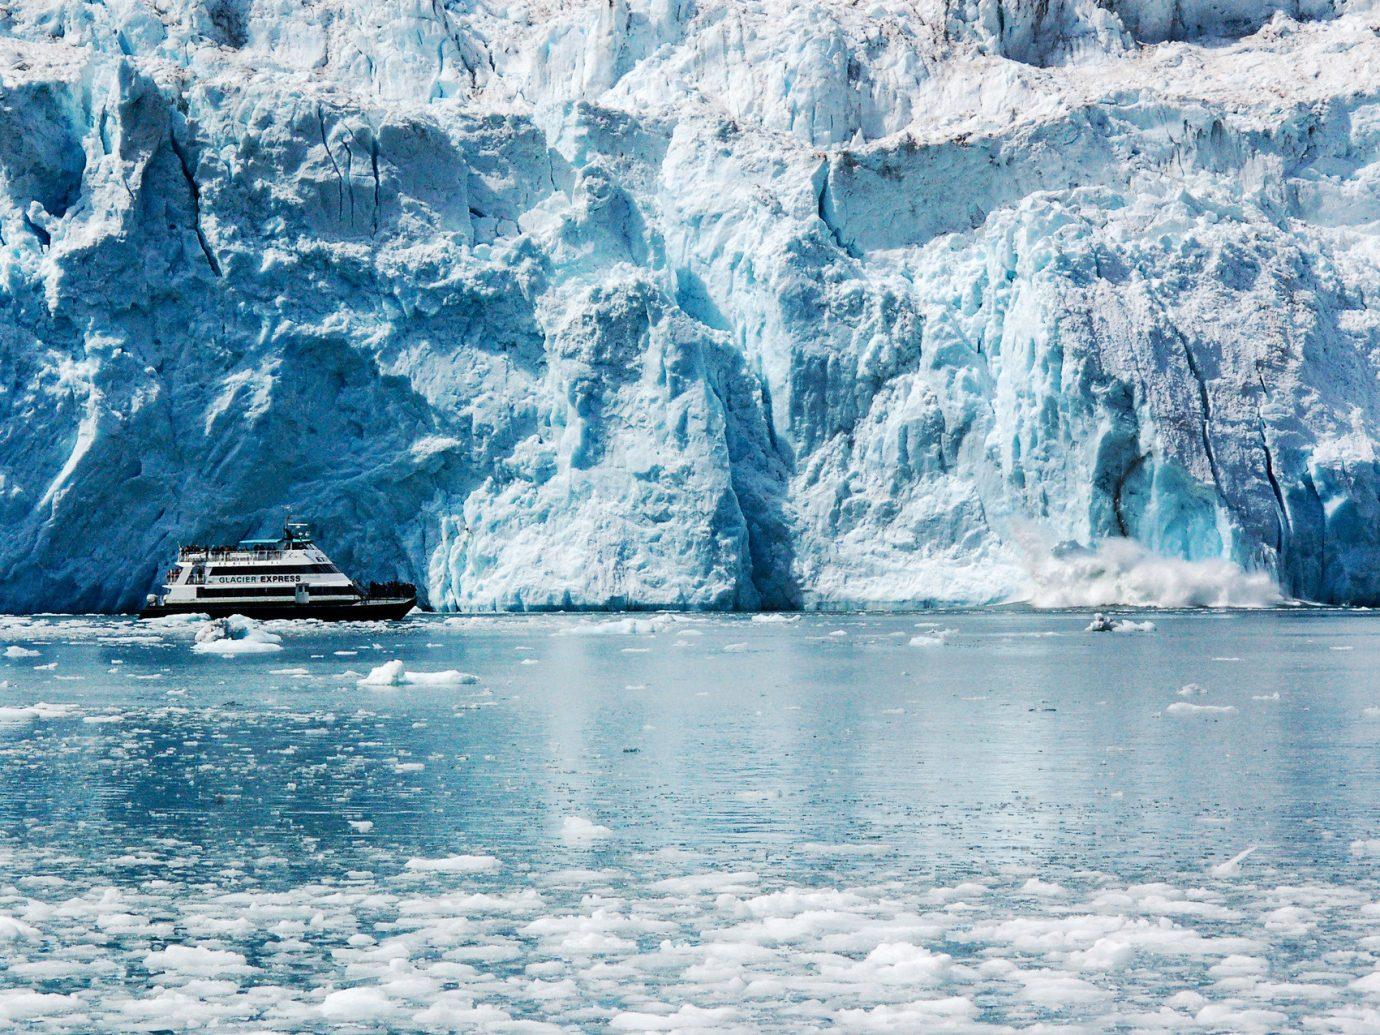 Trip Ideas water outdoor Nature ice geographical feature landform arctic iceberg glacier mountain arctic ocean Ocean glacial landform polar ice cap ice cap Sea sea ice fjord wind wave